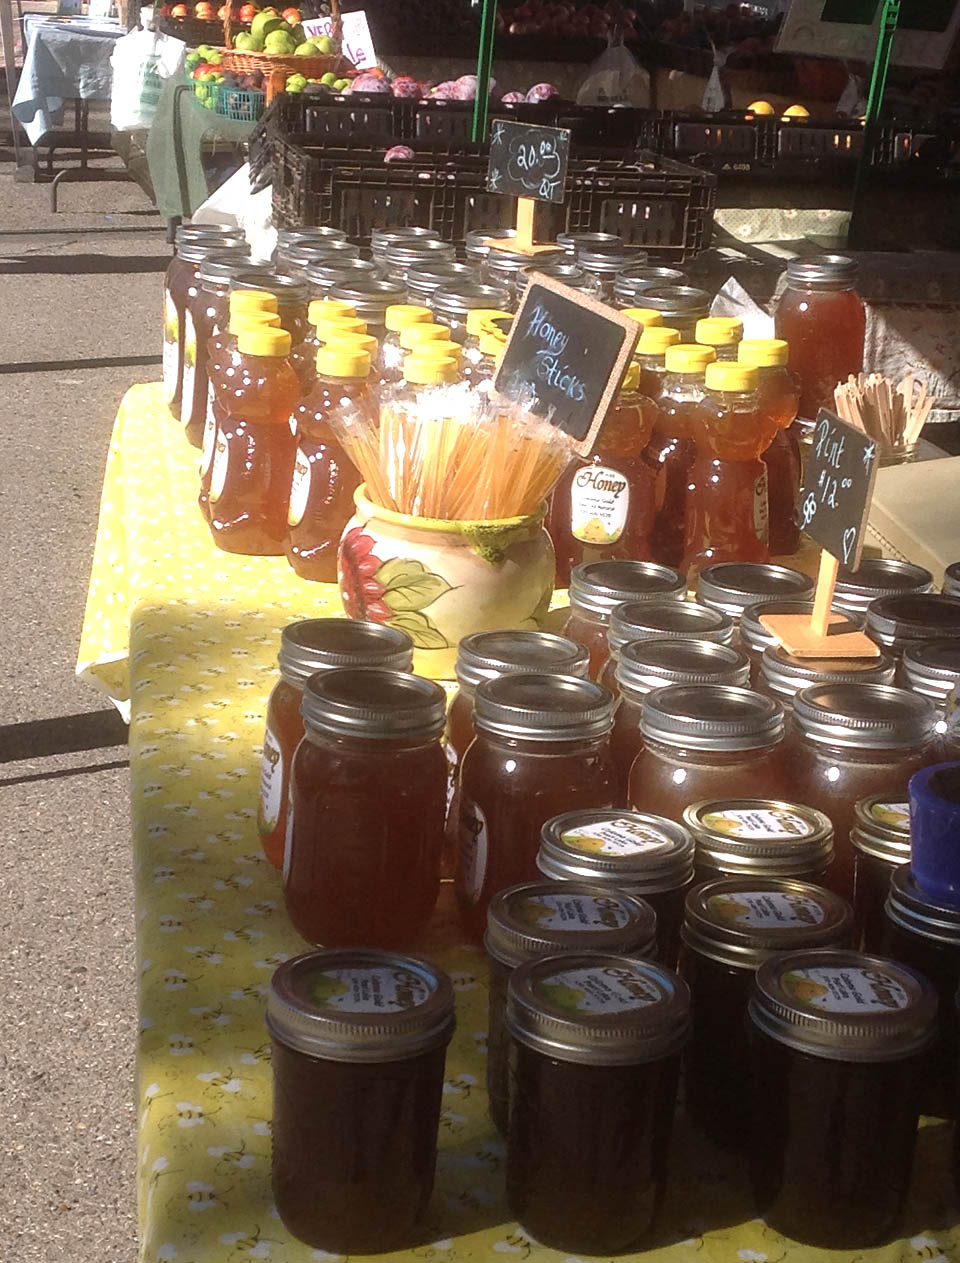 Coloma Gold Honey at the El Dorado County Certified Farmers Market